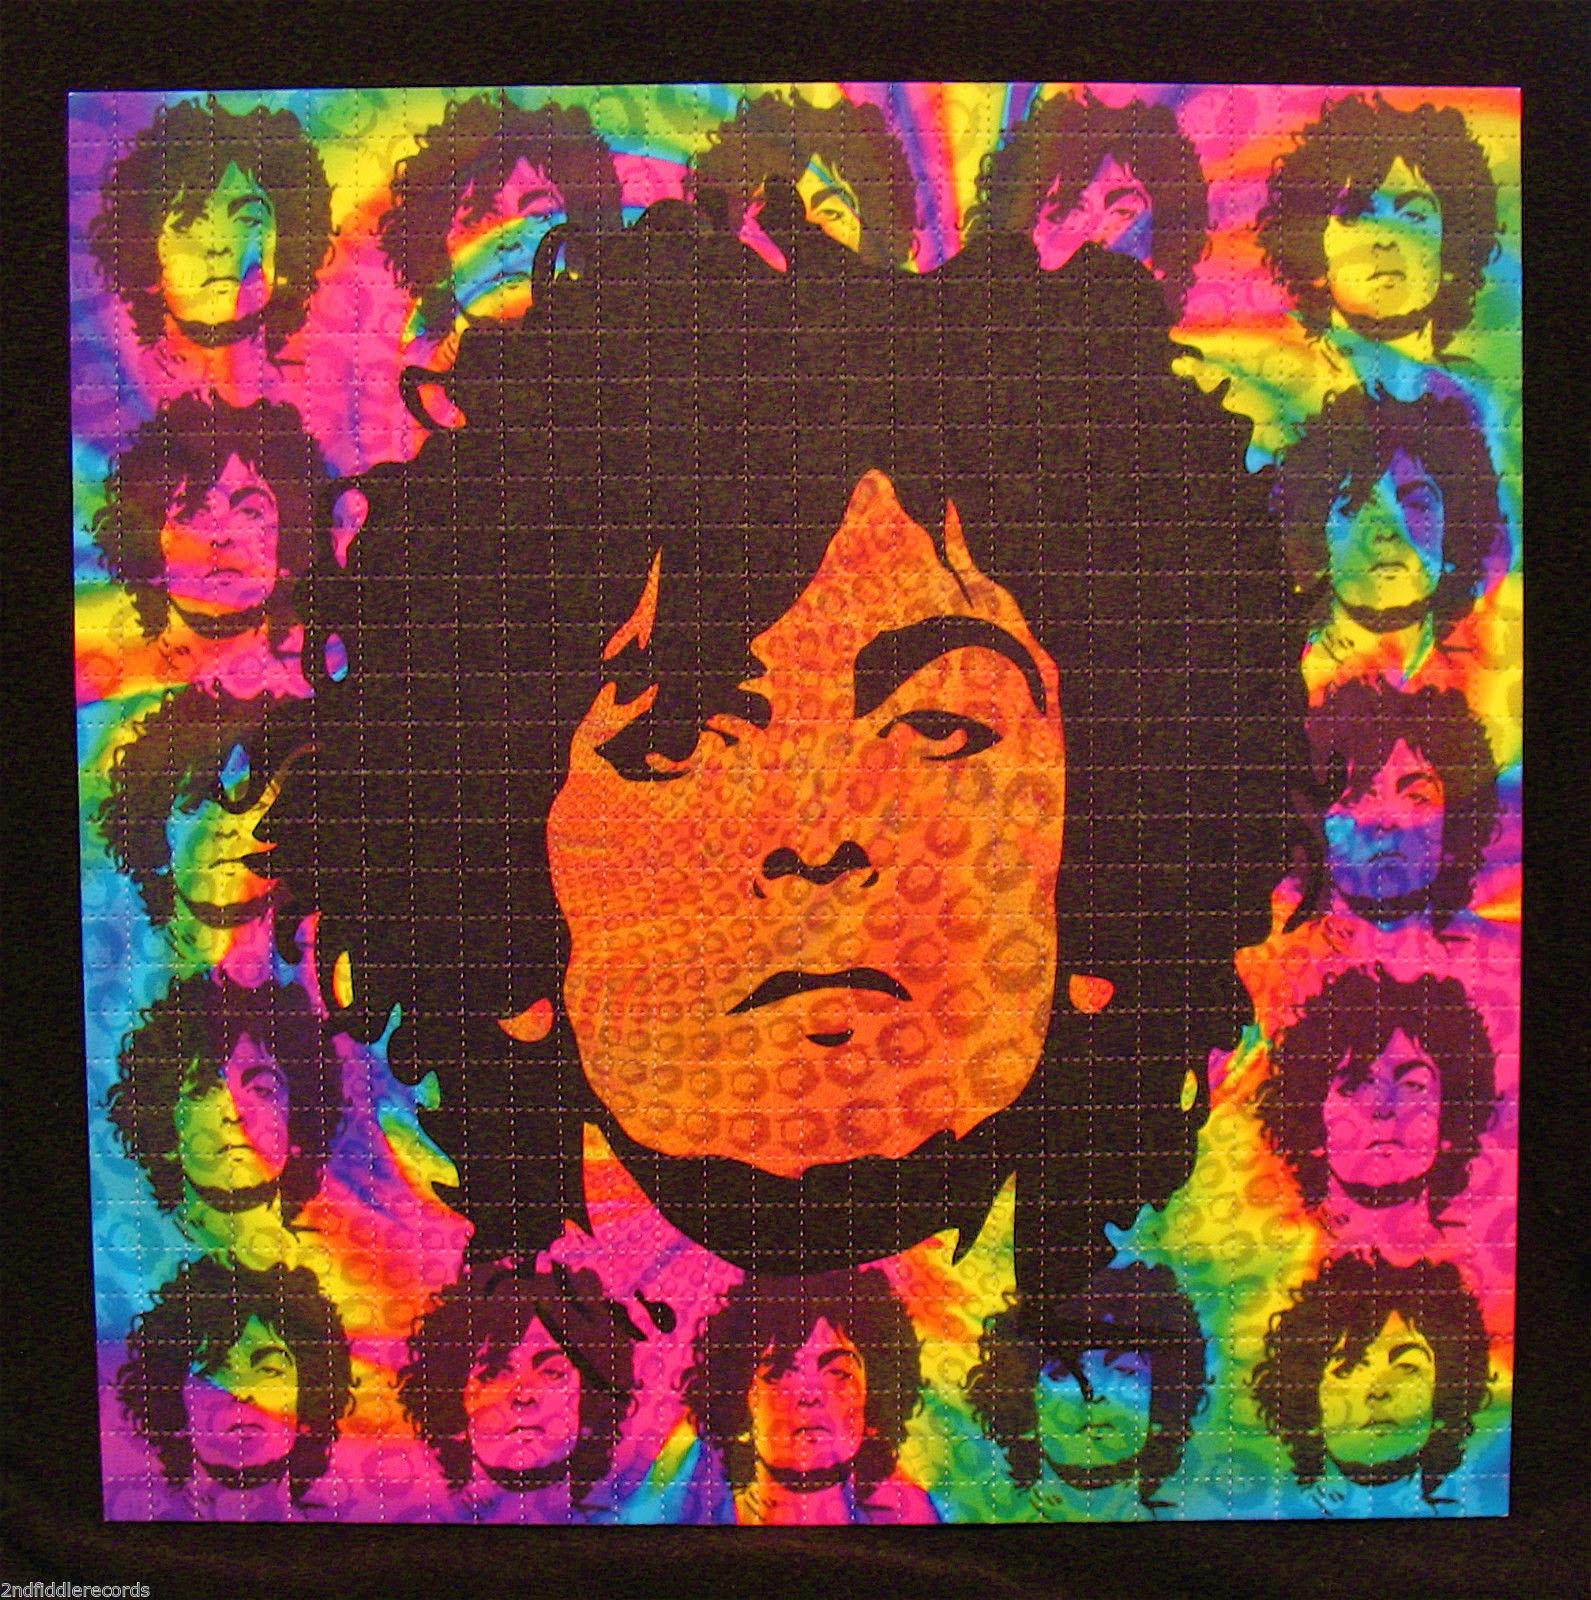 Syd Barrett Interview